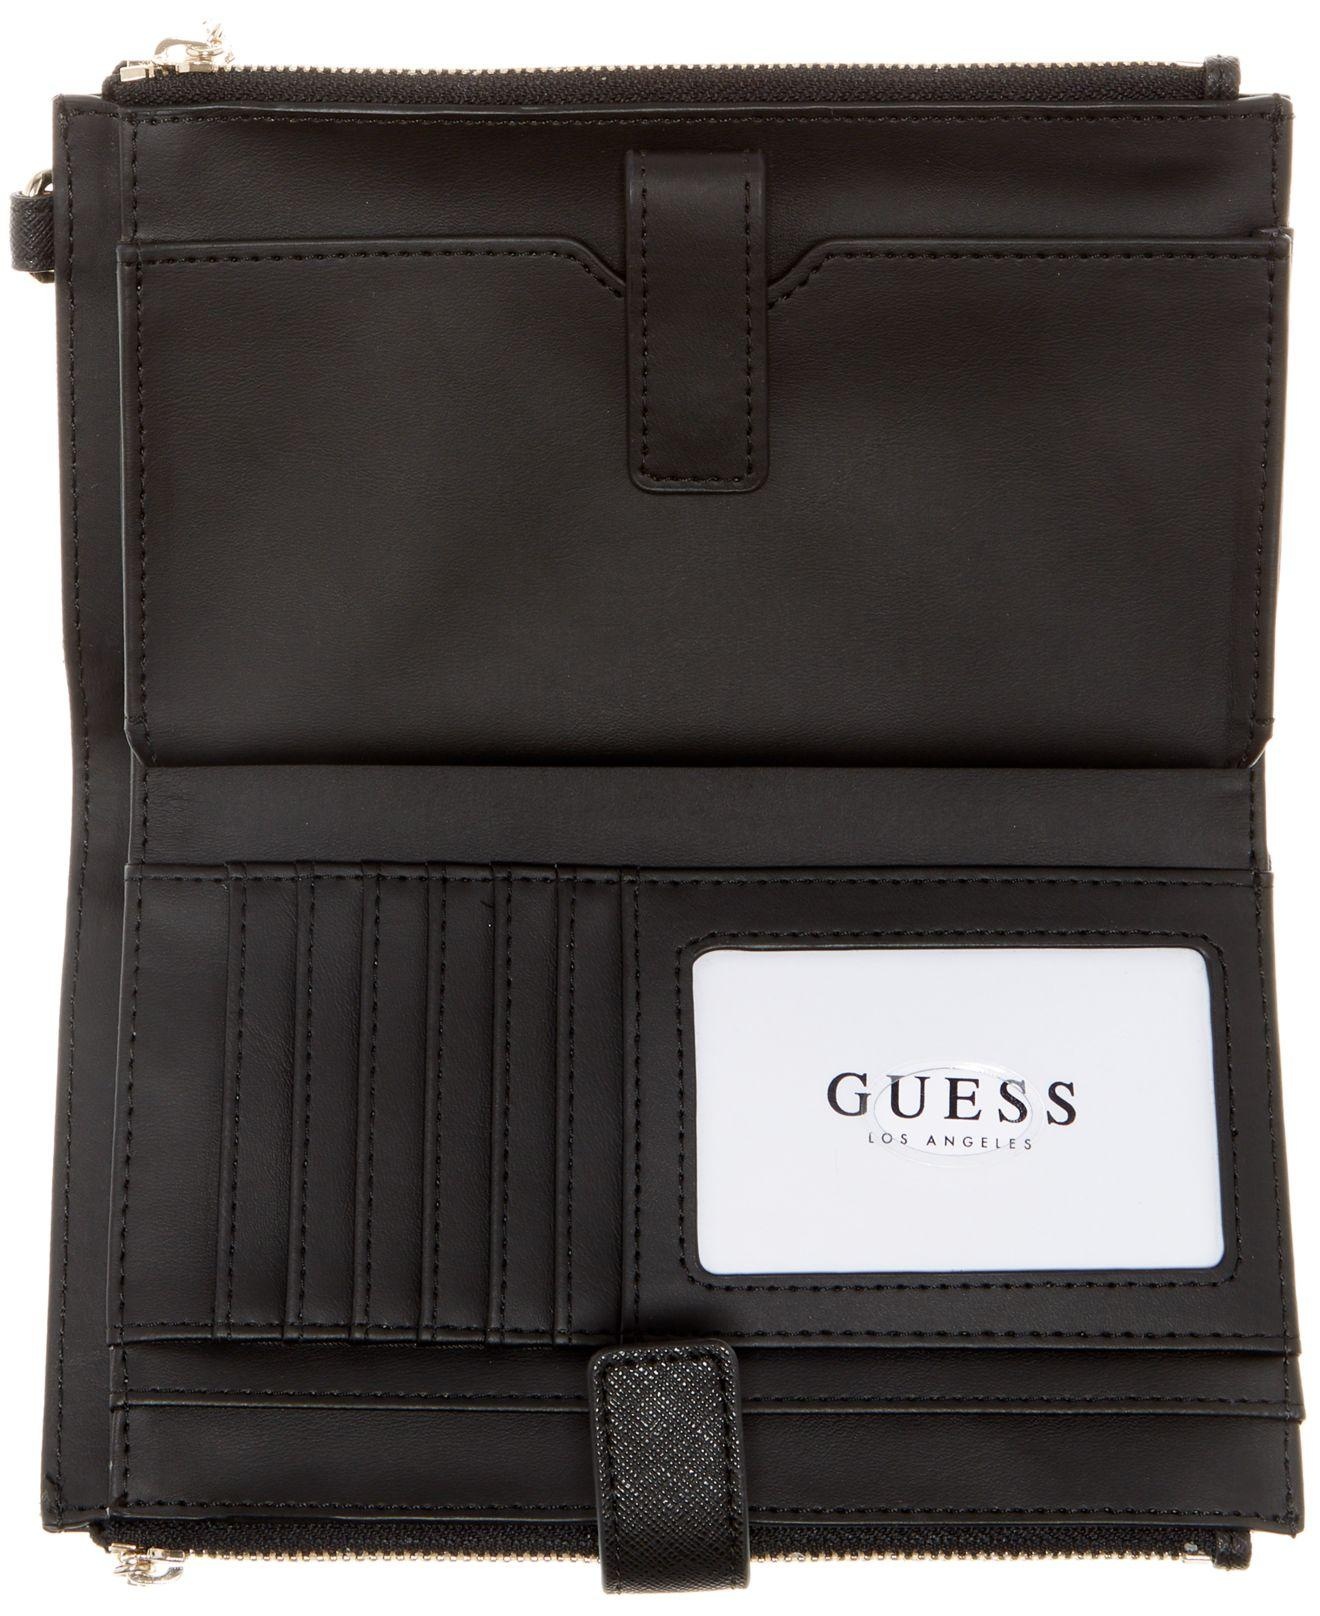 Femmes-Porte Monnaie Purse Wallet Guess Queenie Double Zip Organizer Noir